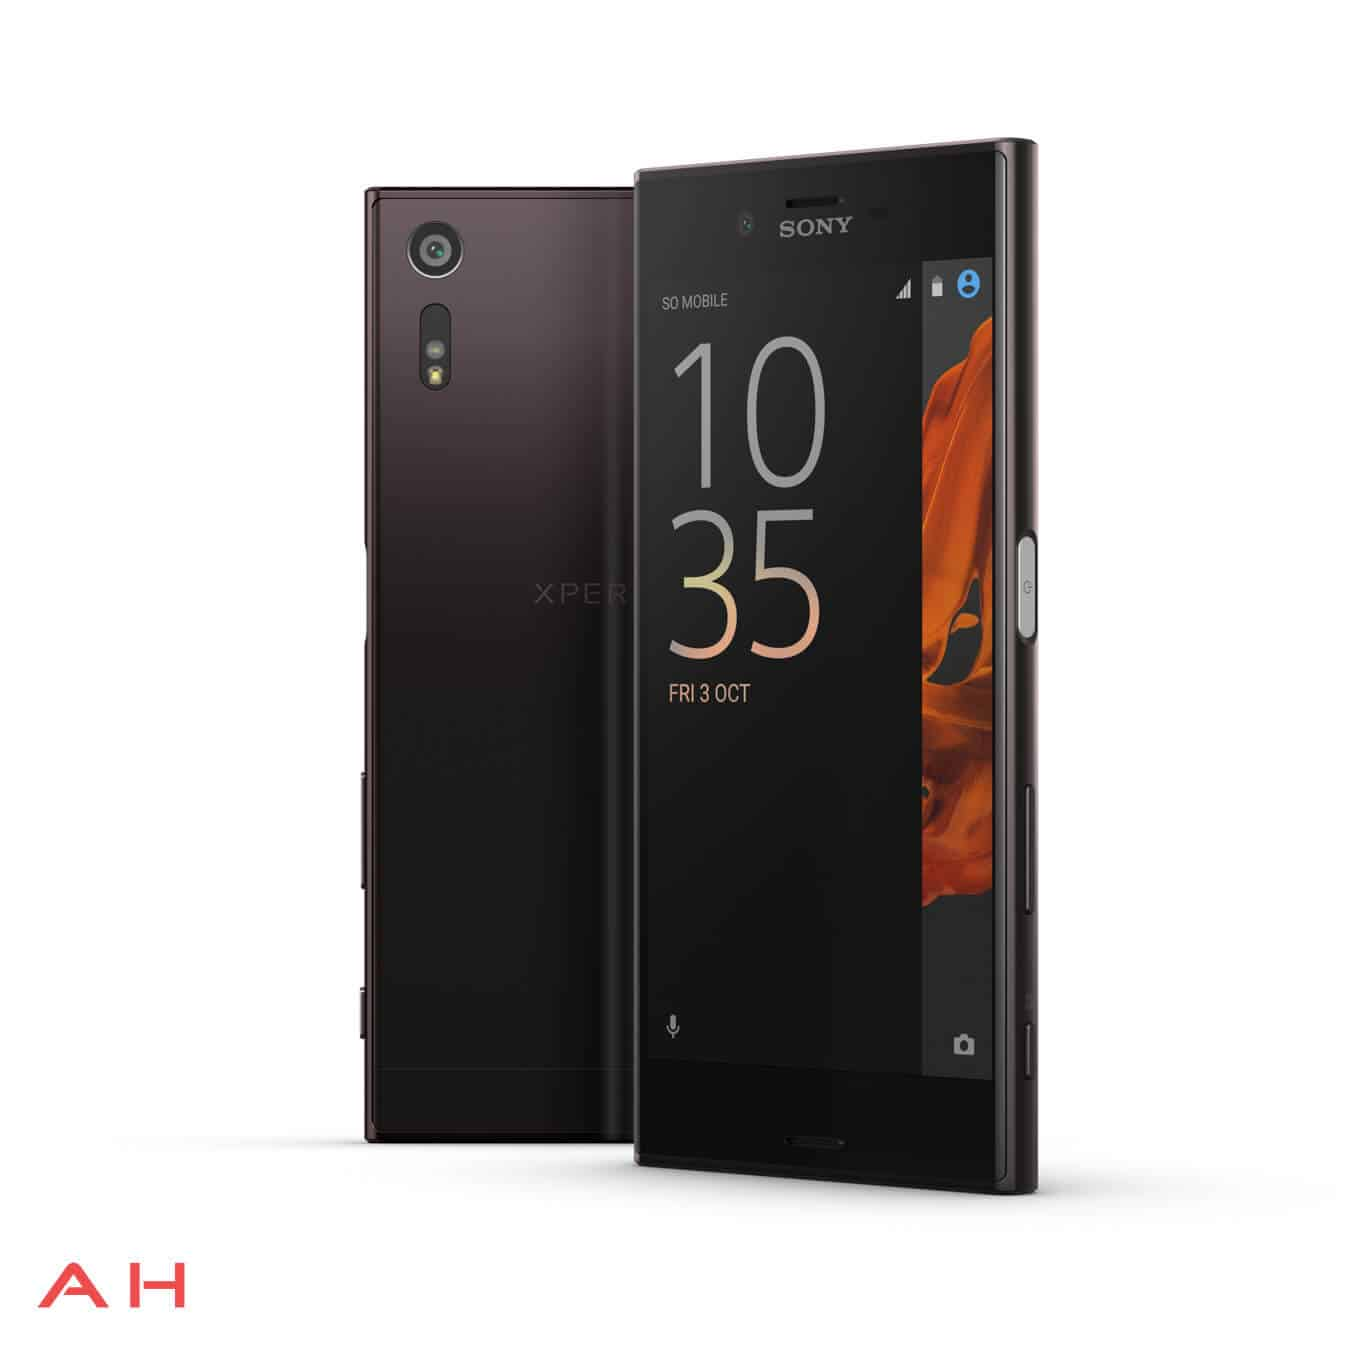 Sony Xperia XZ AH 14 1